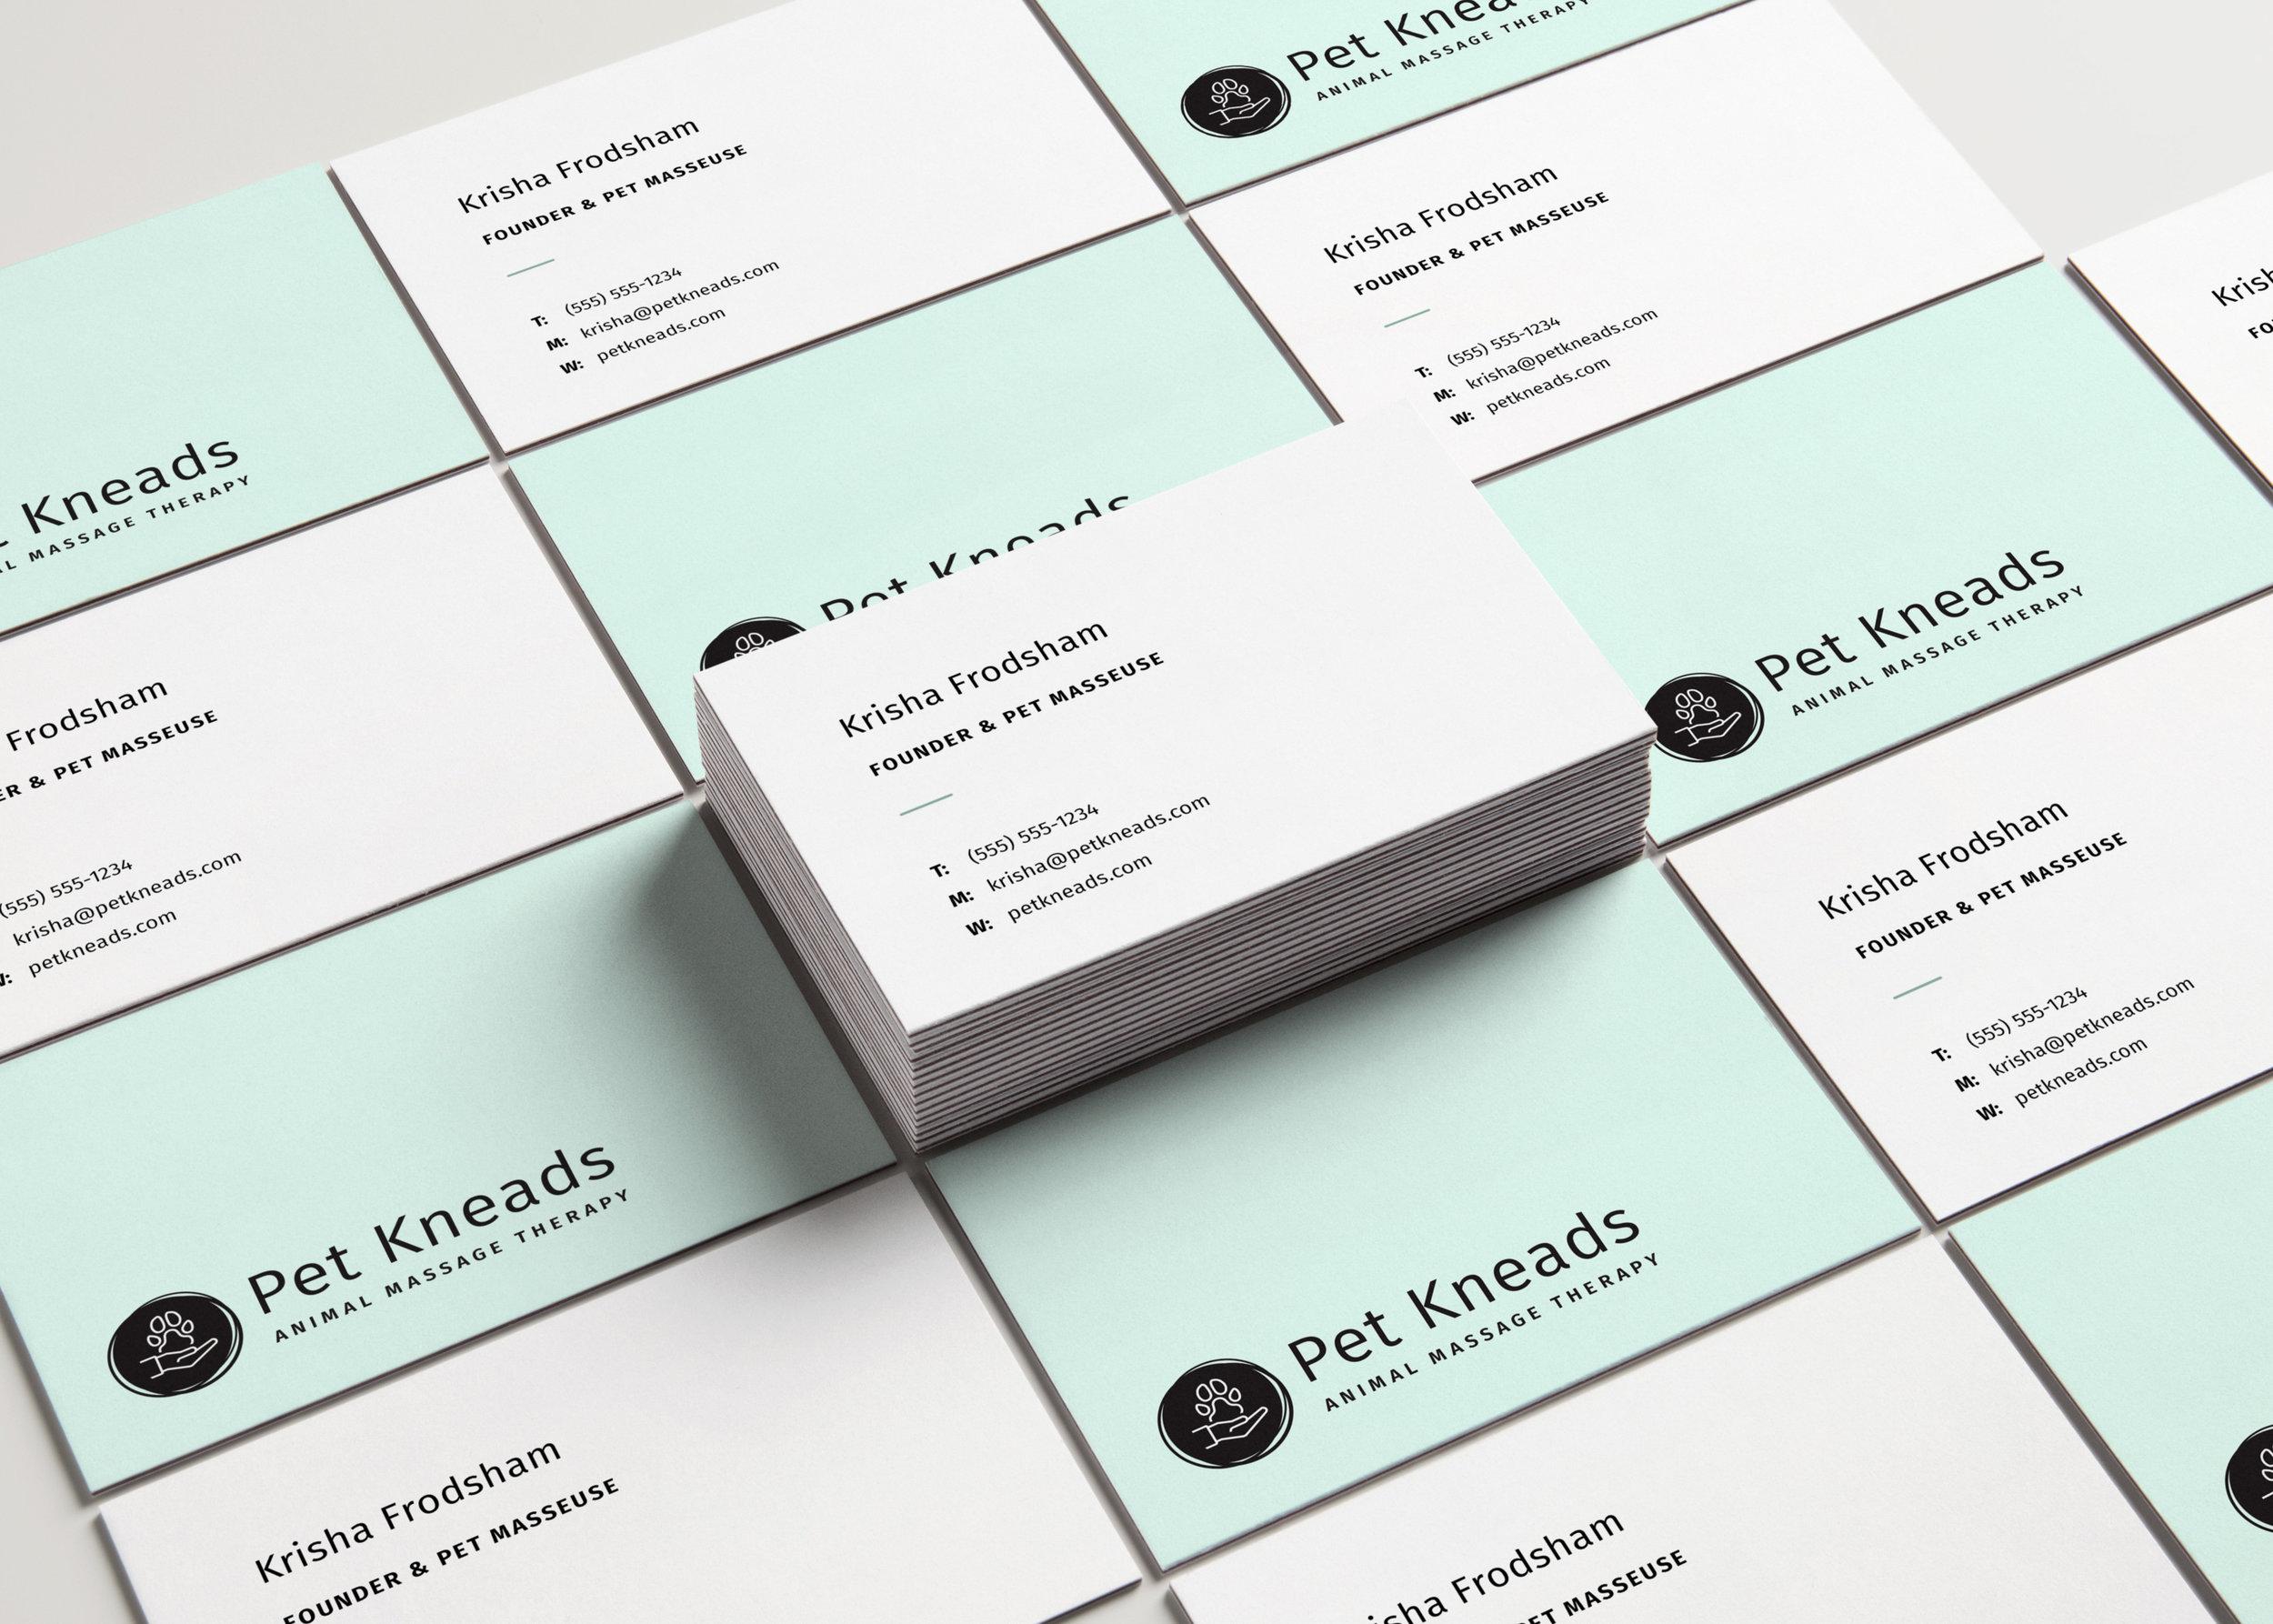 PetKneads-Business Cards MockUp 2.jpg